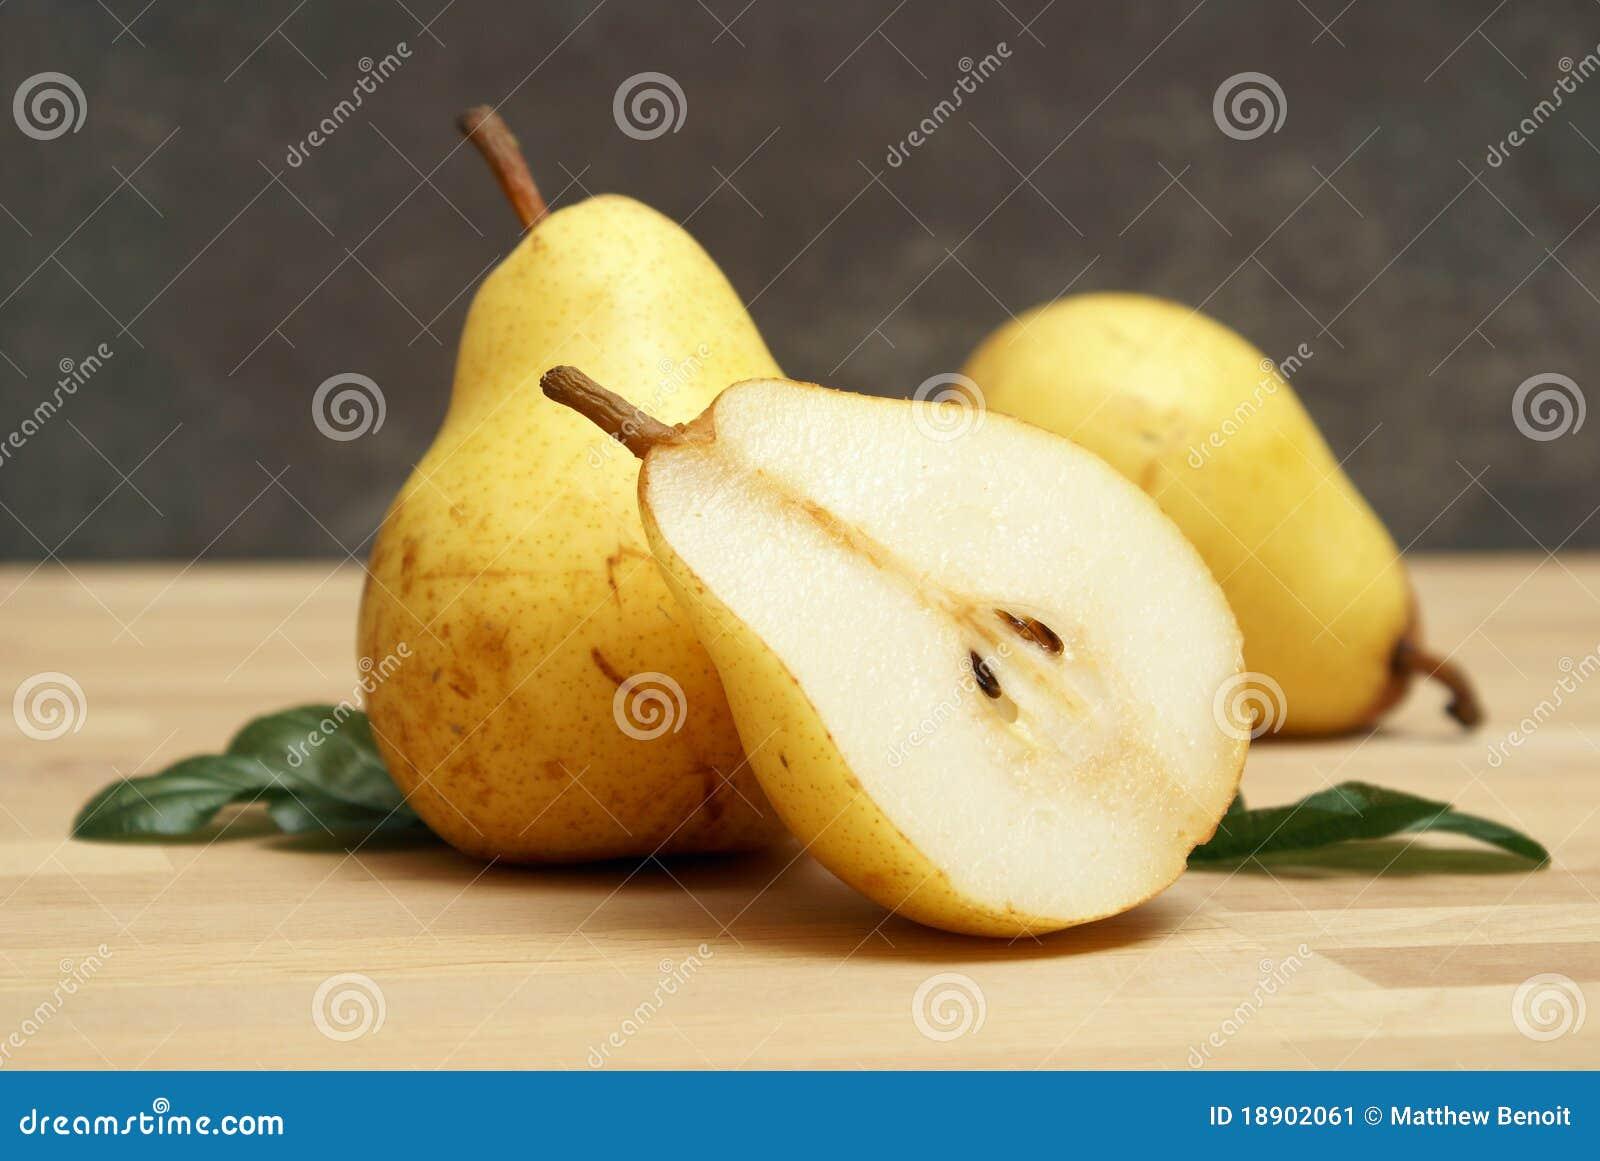 Pear Still Life Stock Image - Image: 18902061